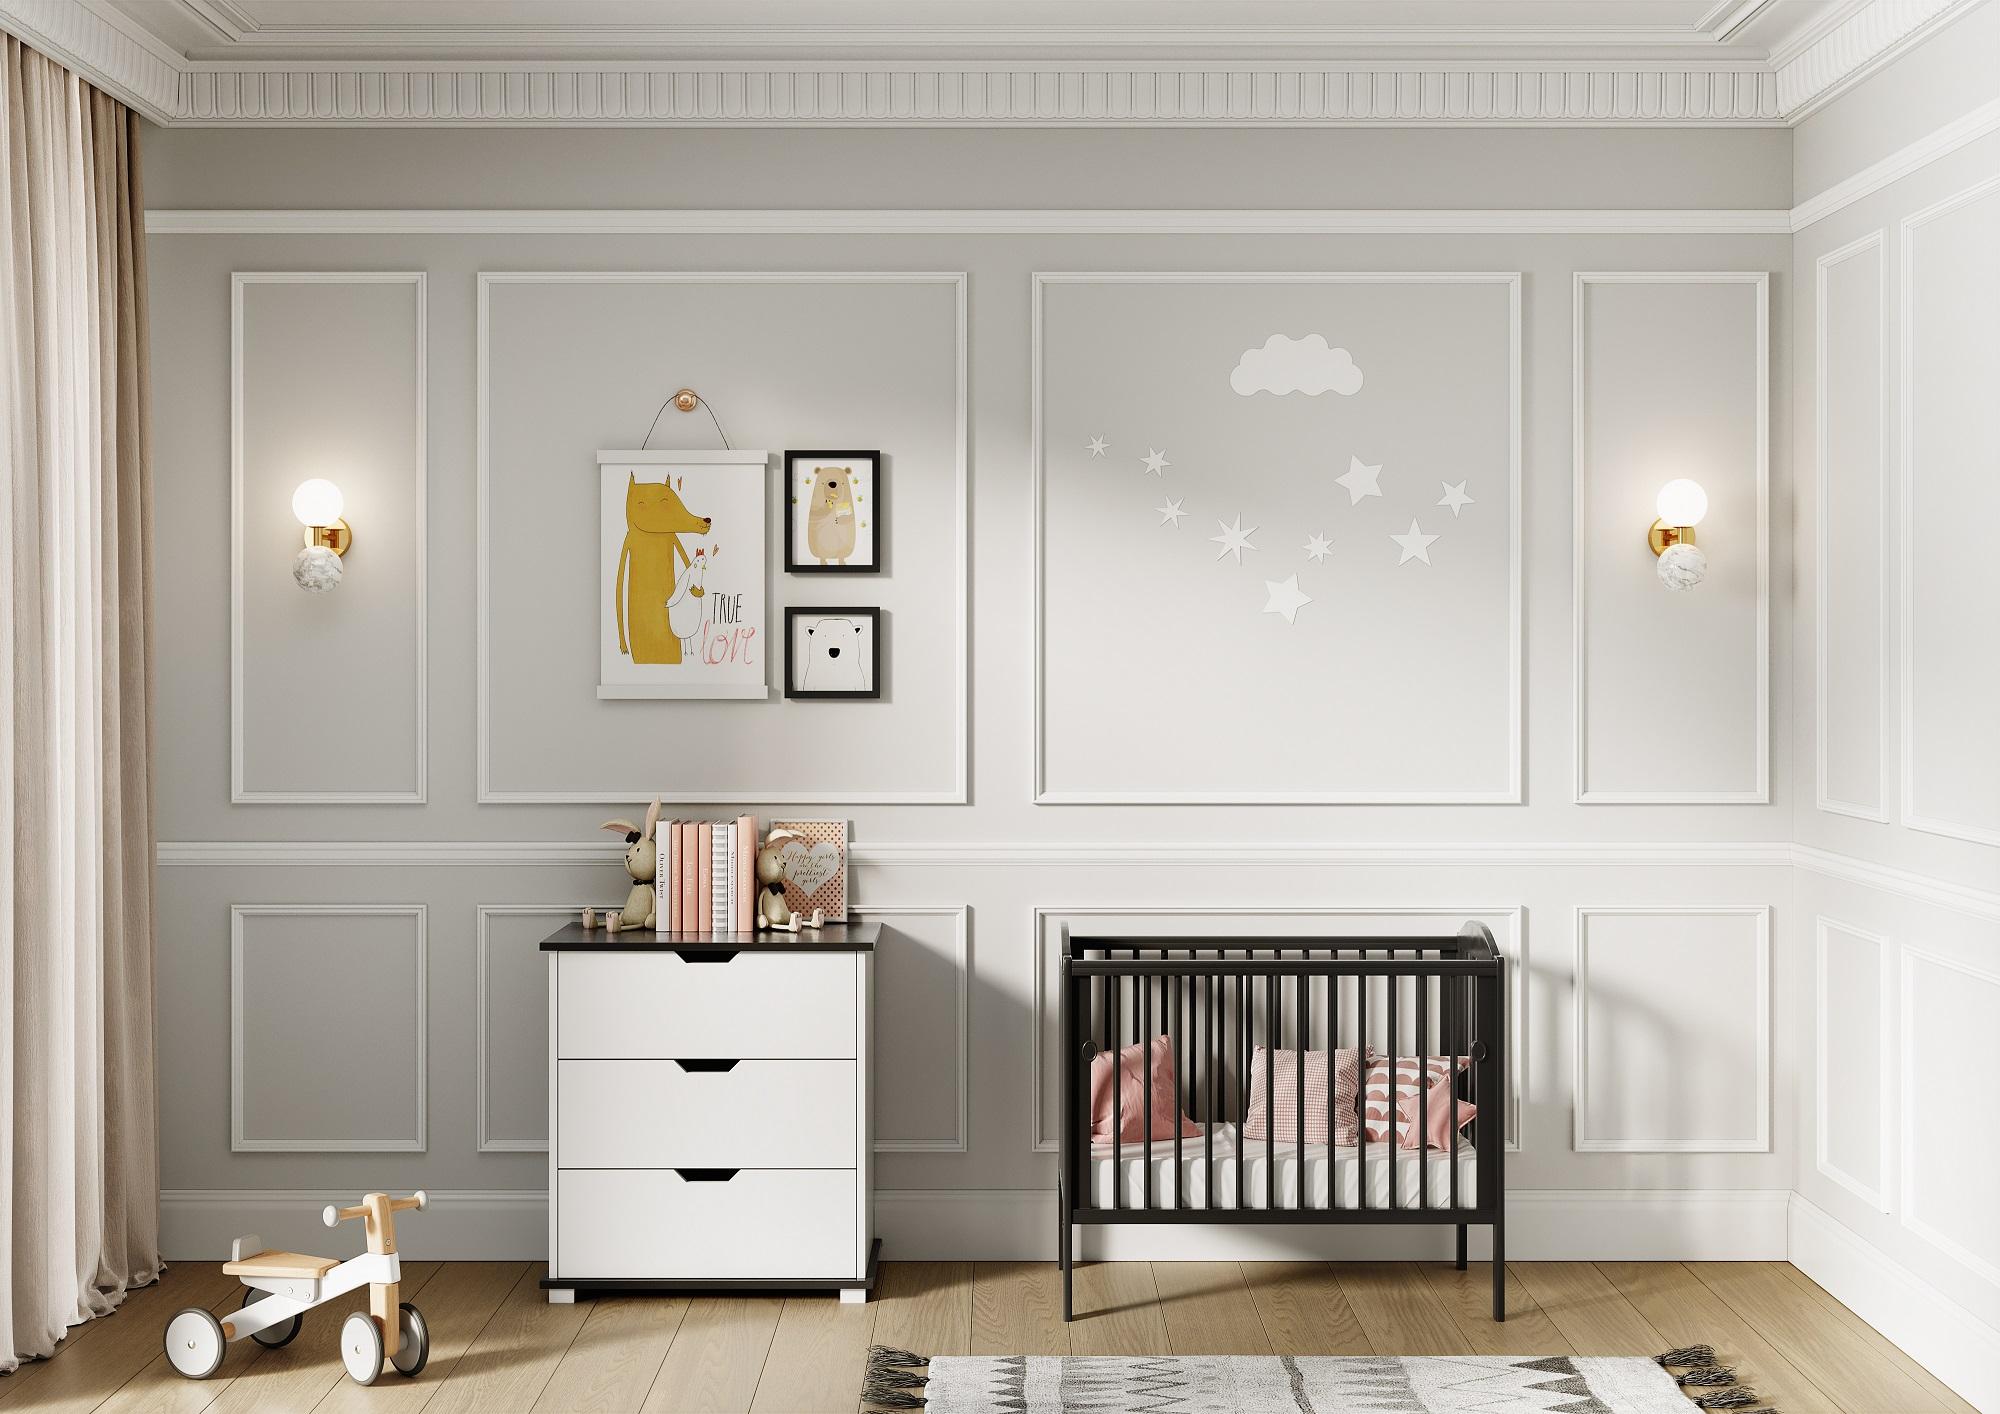 Buy Online Me-Baby Tobie Black Baby Cots